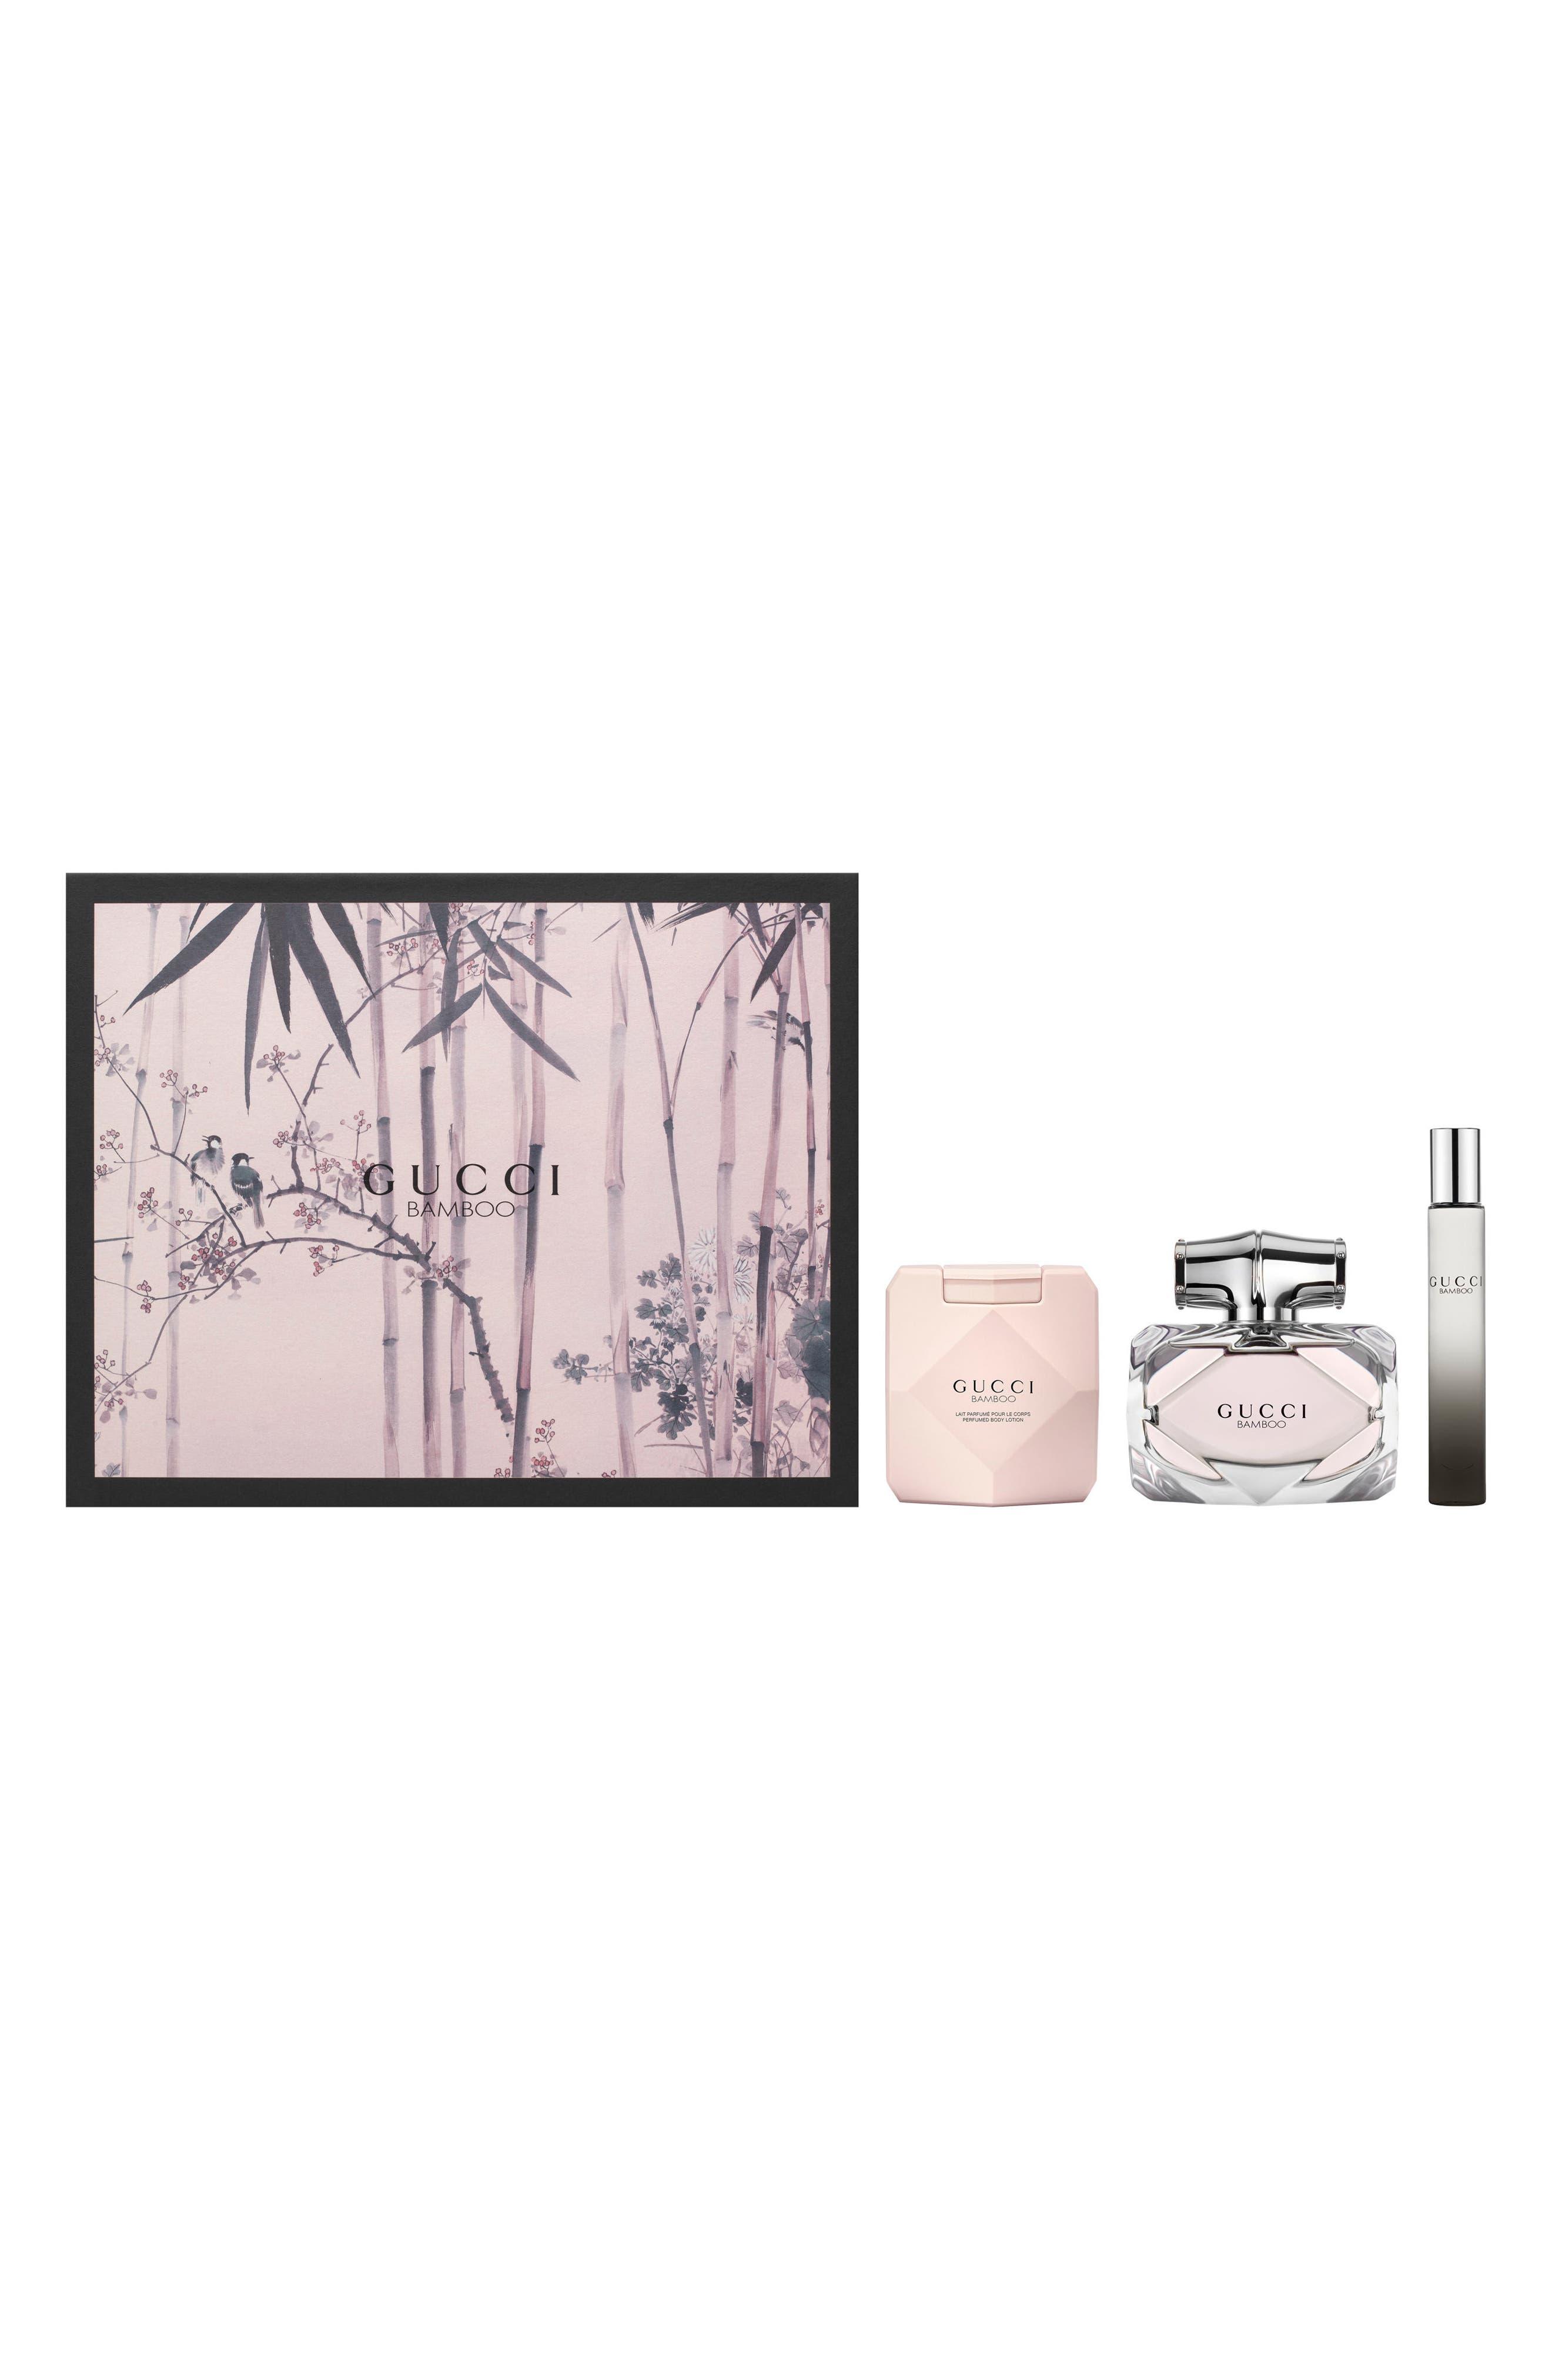 Bamboo Eau de Parfum Set,                             Main thumbnail 1, color,                             000